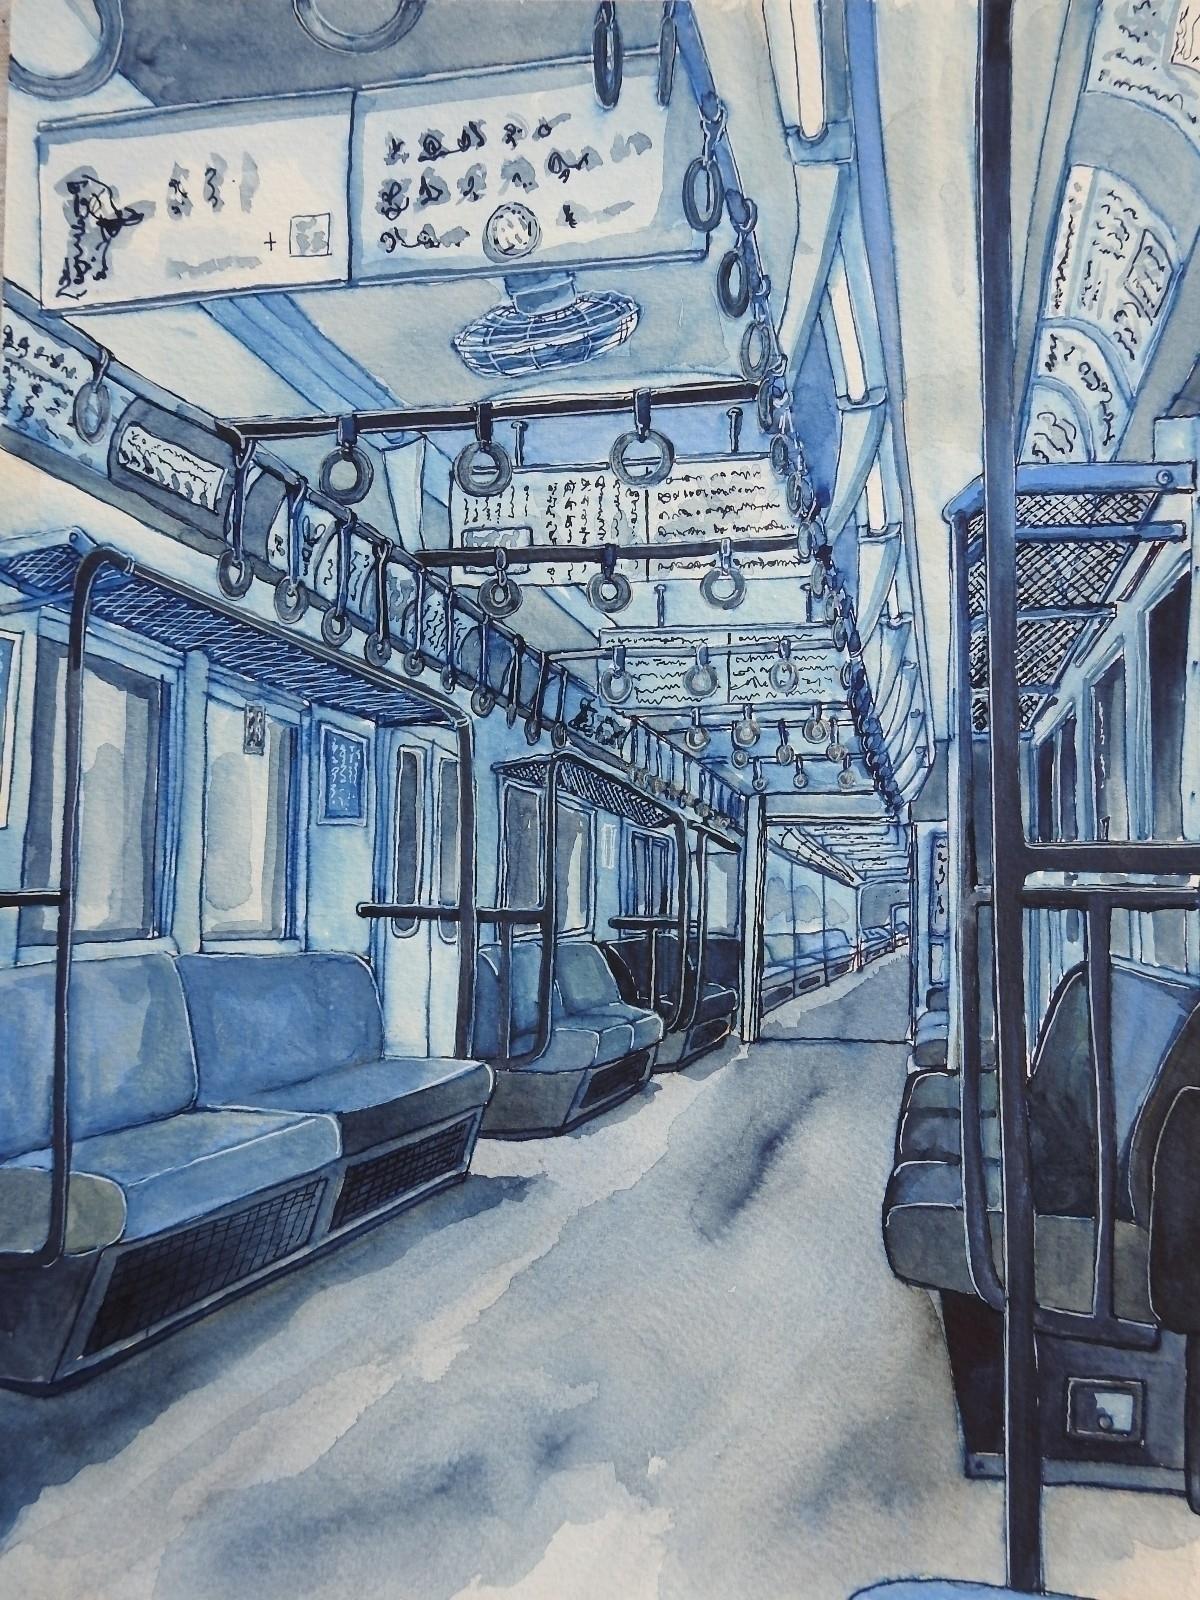 Empty train carriage, Tokyo. 20 - bluebearvendingco   ello